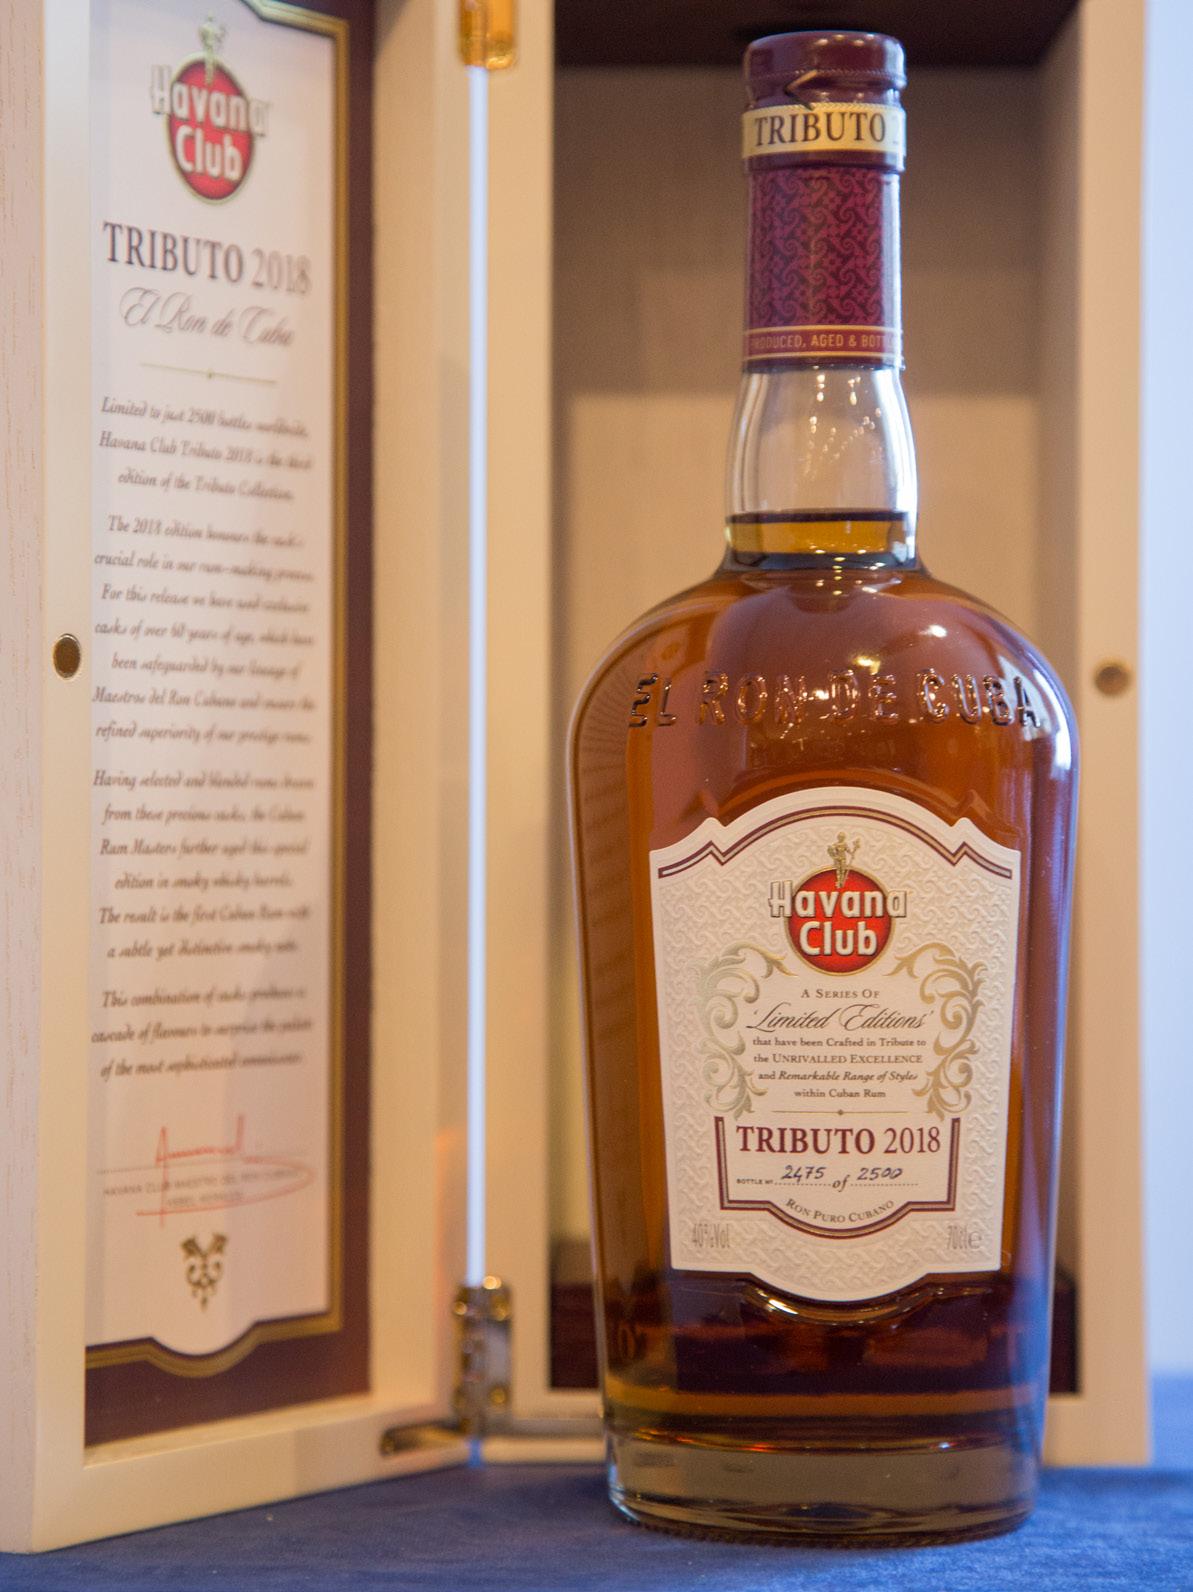 Casa De Muñecas Pequeña Escala bebida barriles = Whisky de Malta